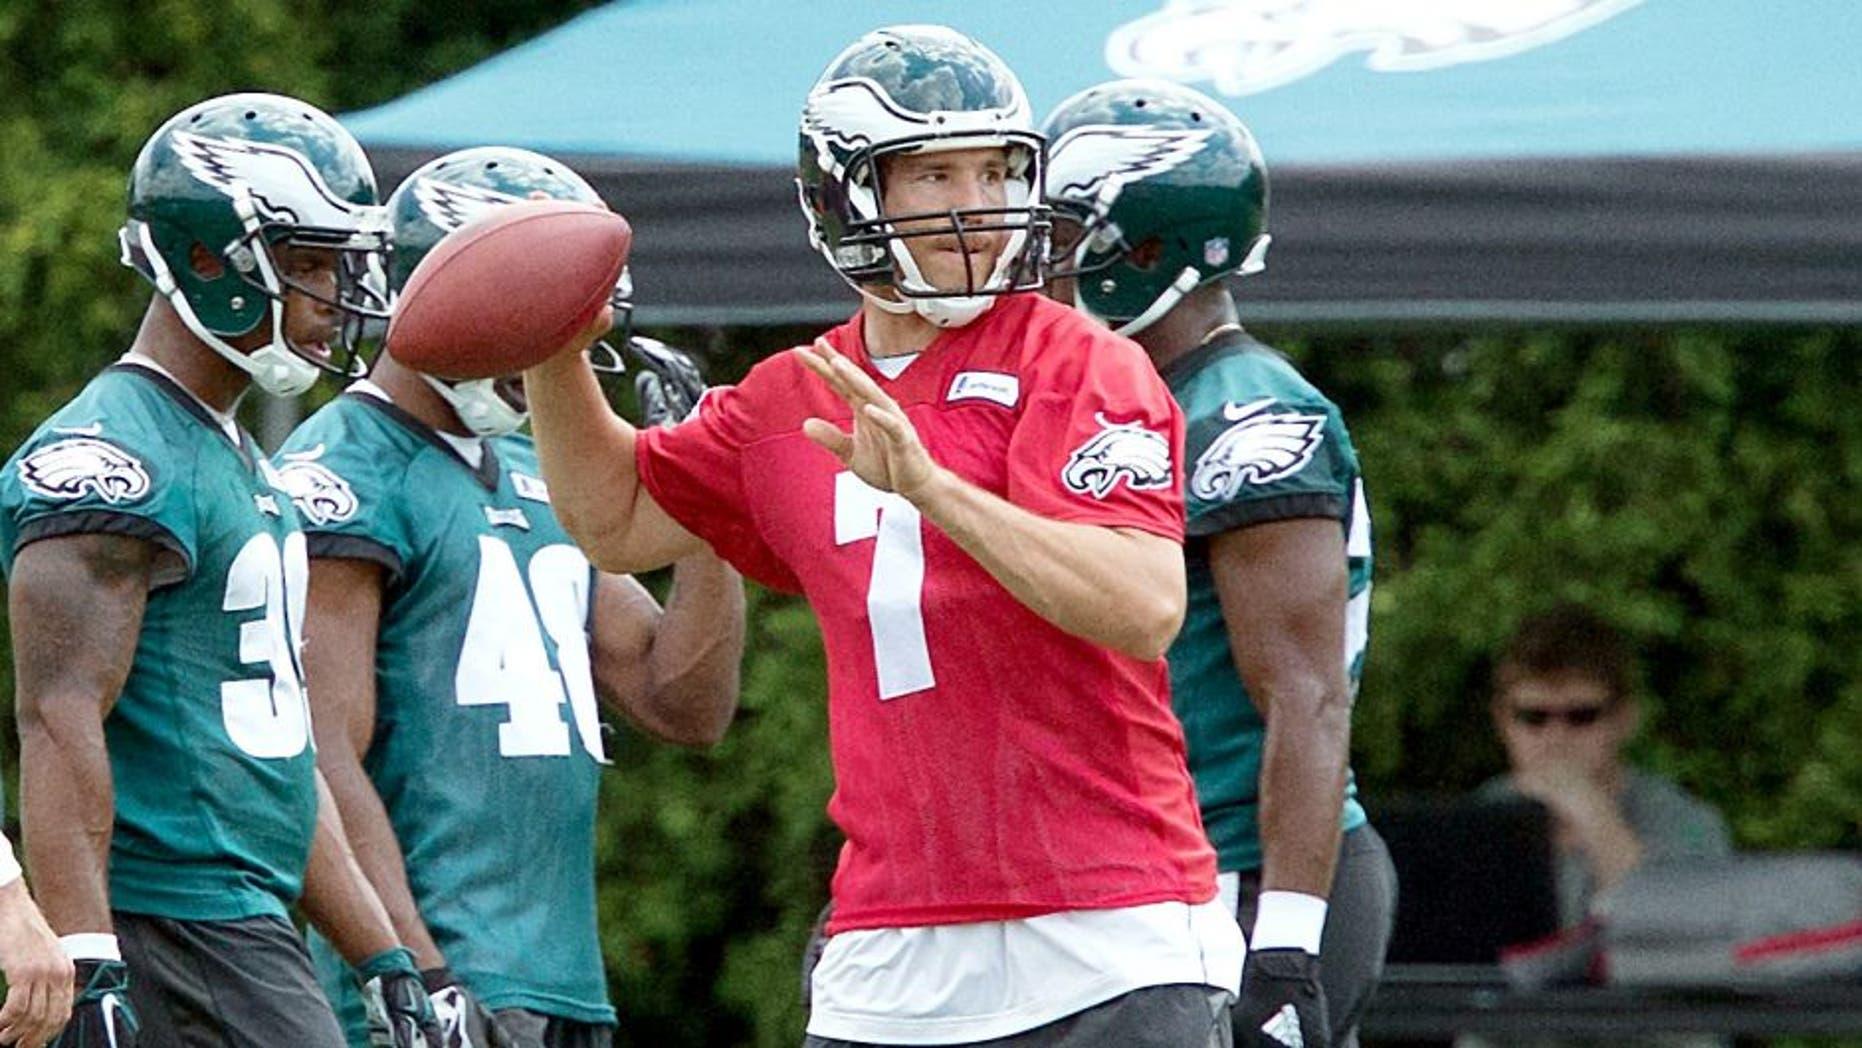 Jun 17, 2015; Philadelphia, PA, USA; Philadelphia Eagles quarterback Sam Bradford (7) throws during minicamp at The NovaCare Complex. Mandatory Credit: Bill Streicher-USA TODAY Sports